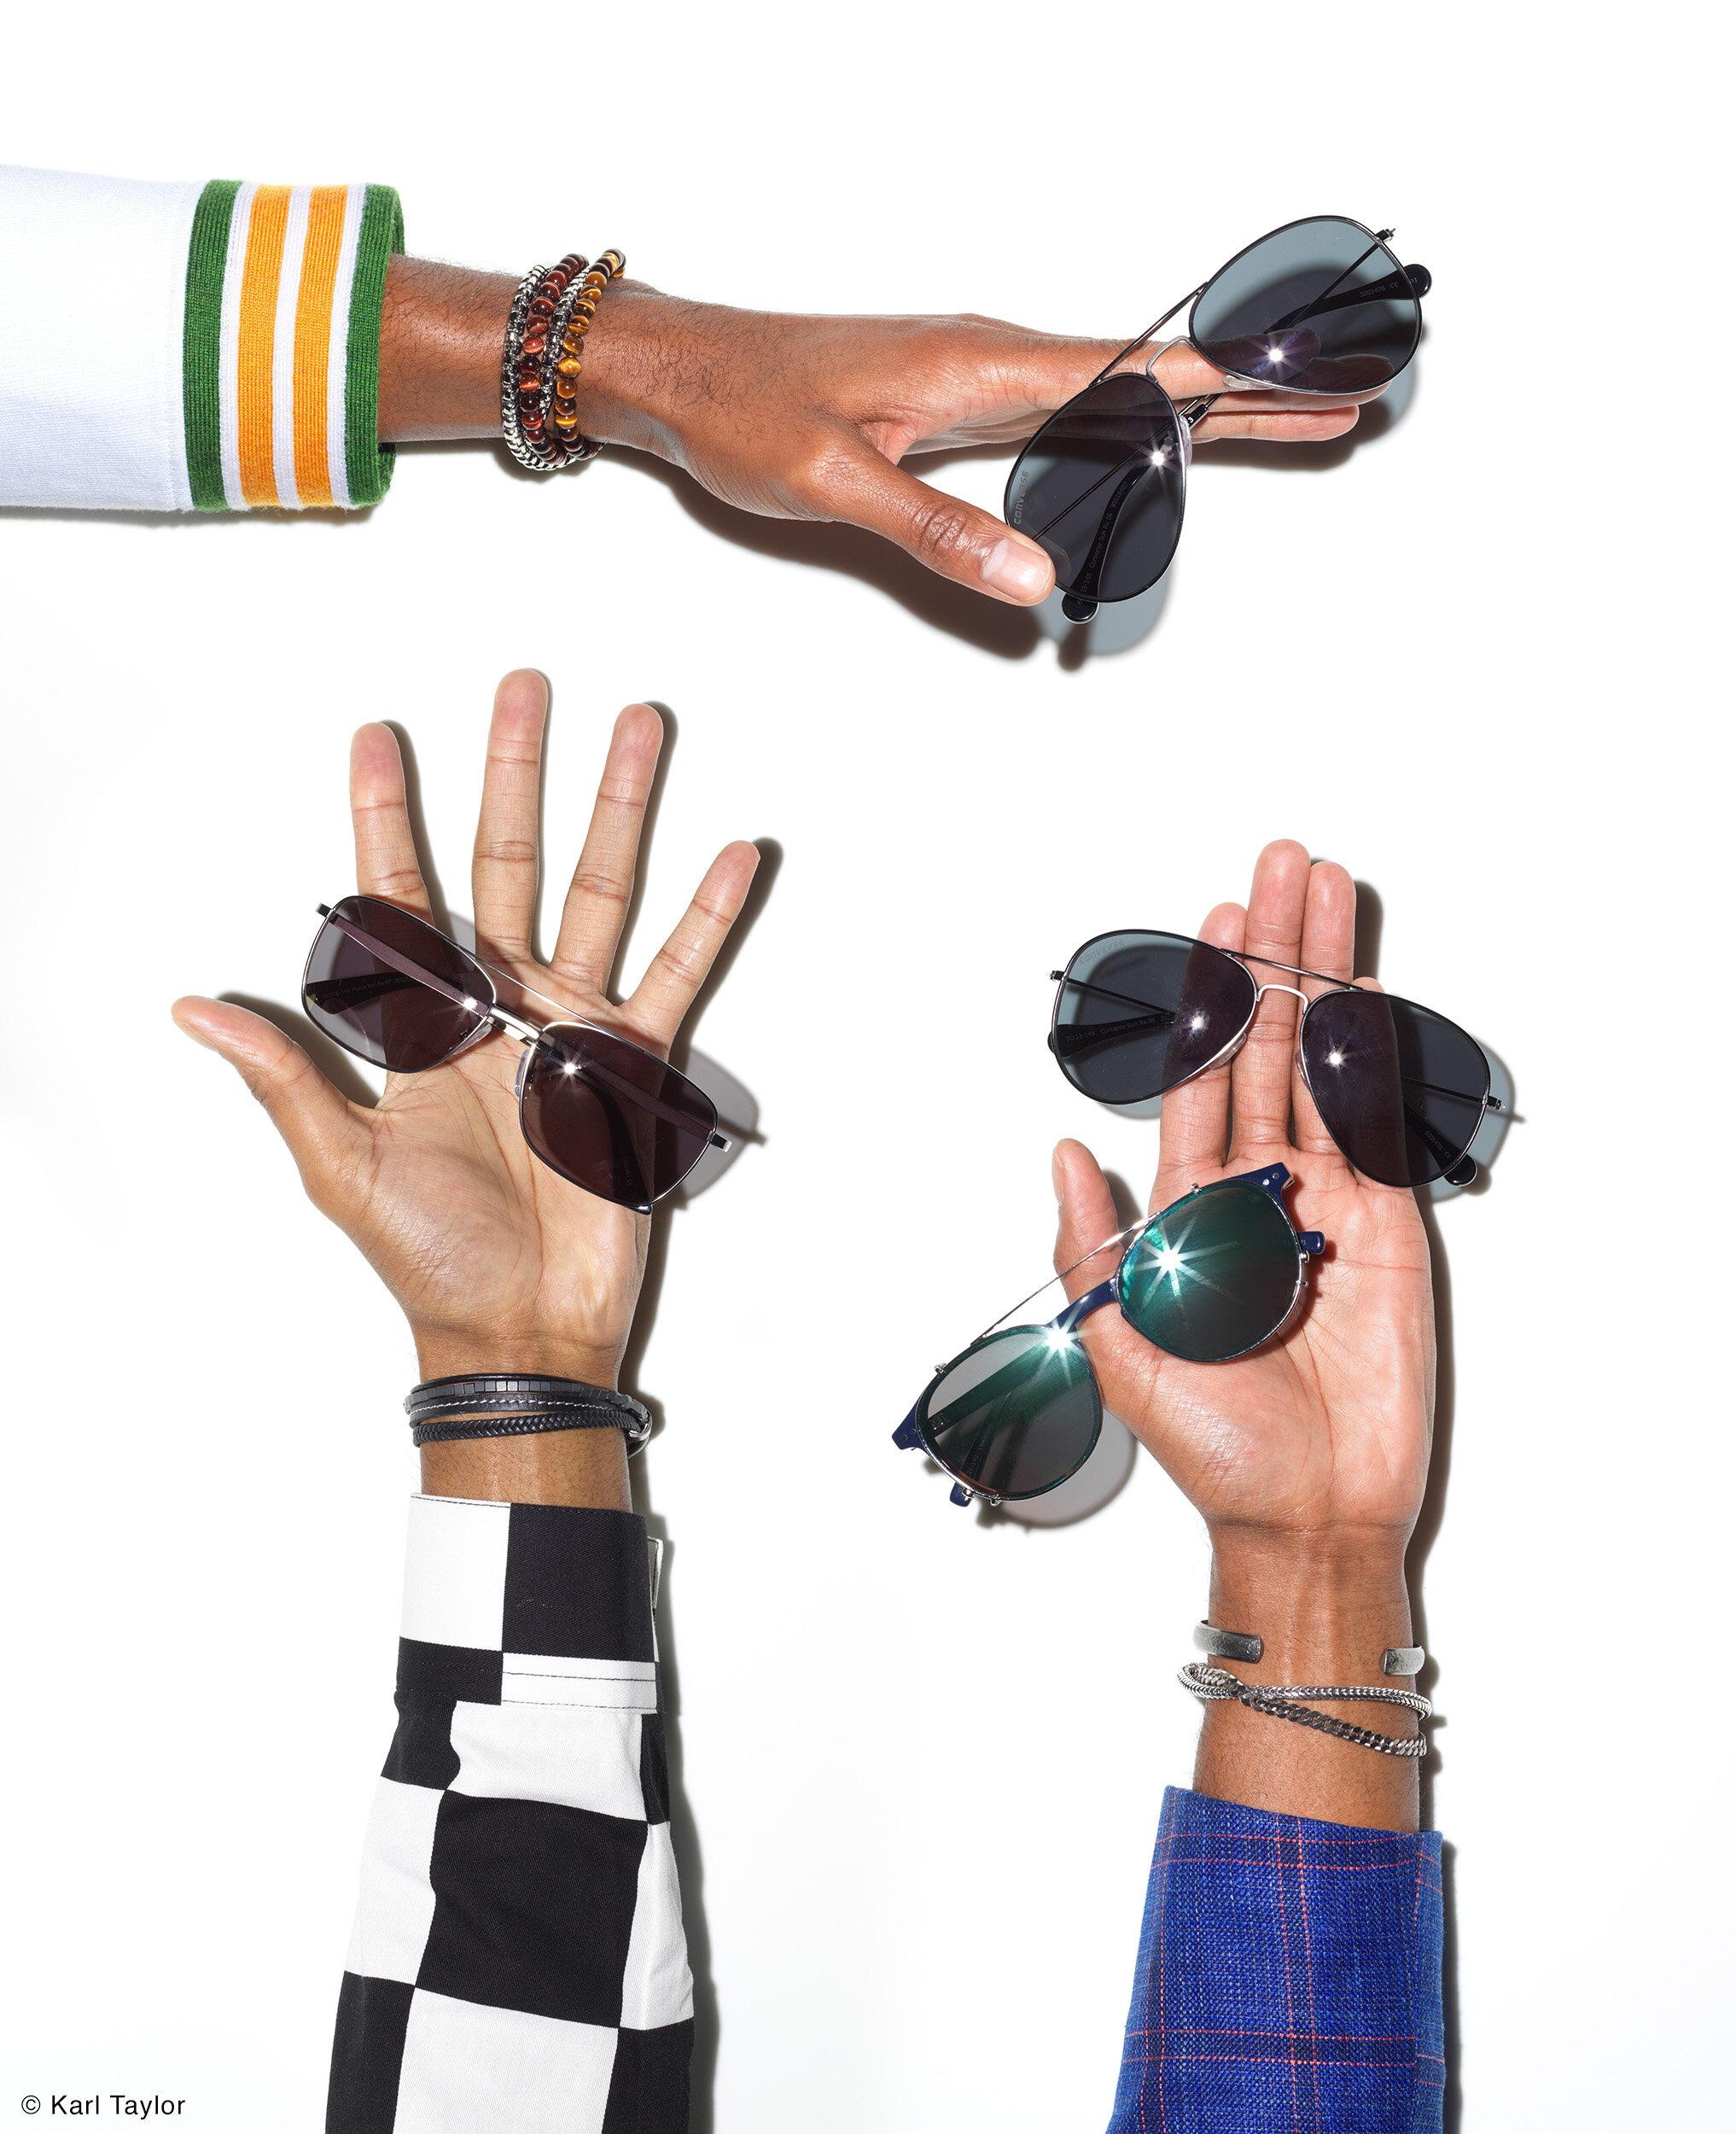 Karl_Taylor_sunglasses_hands.jpg